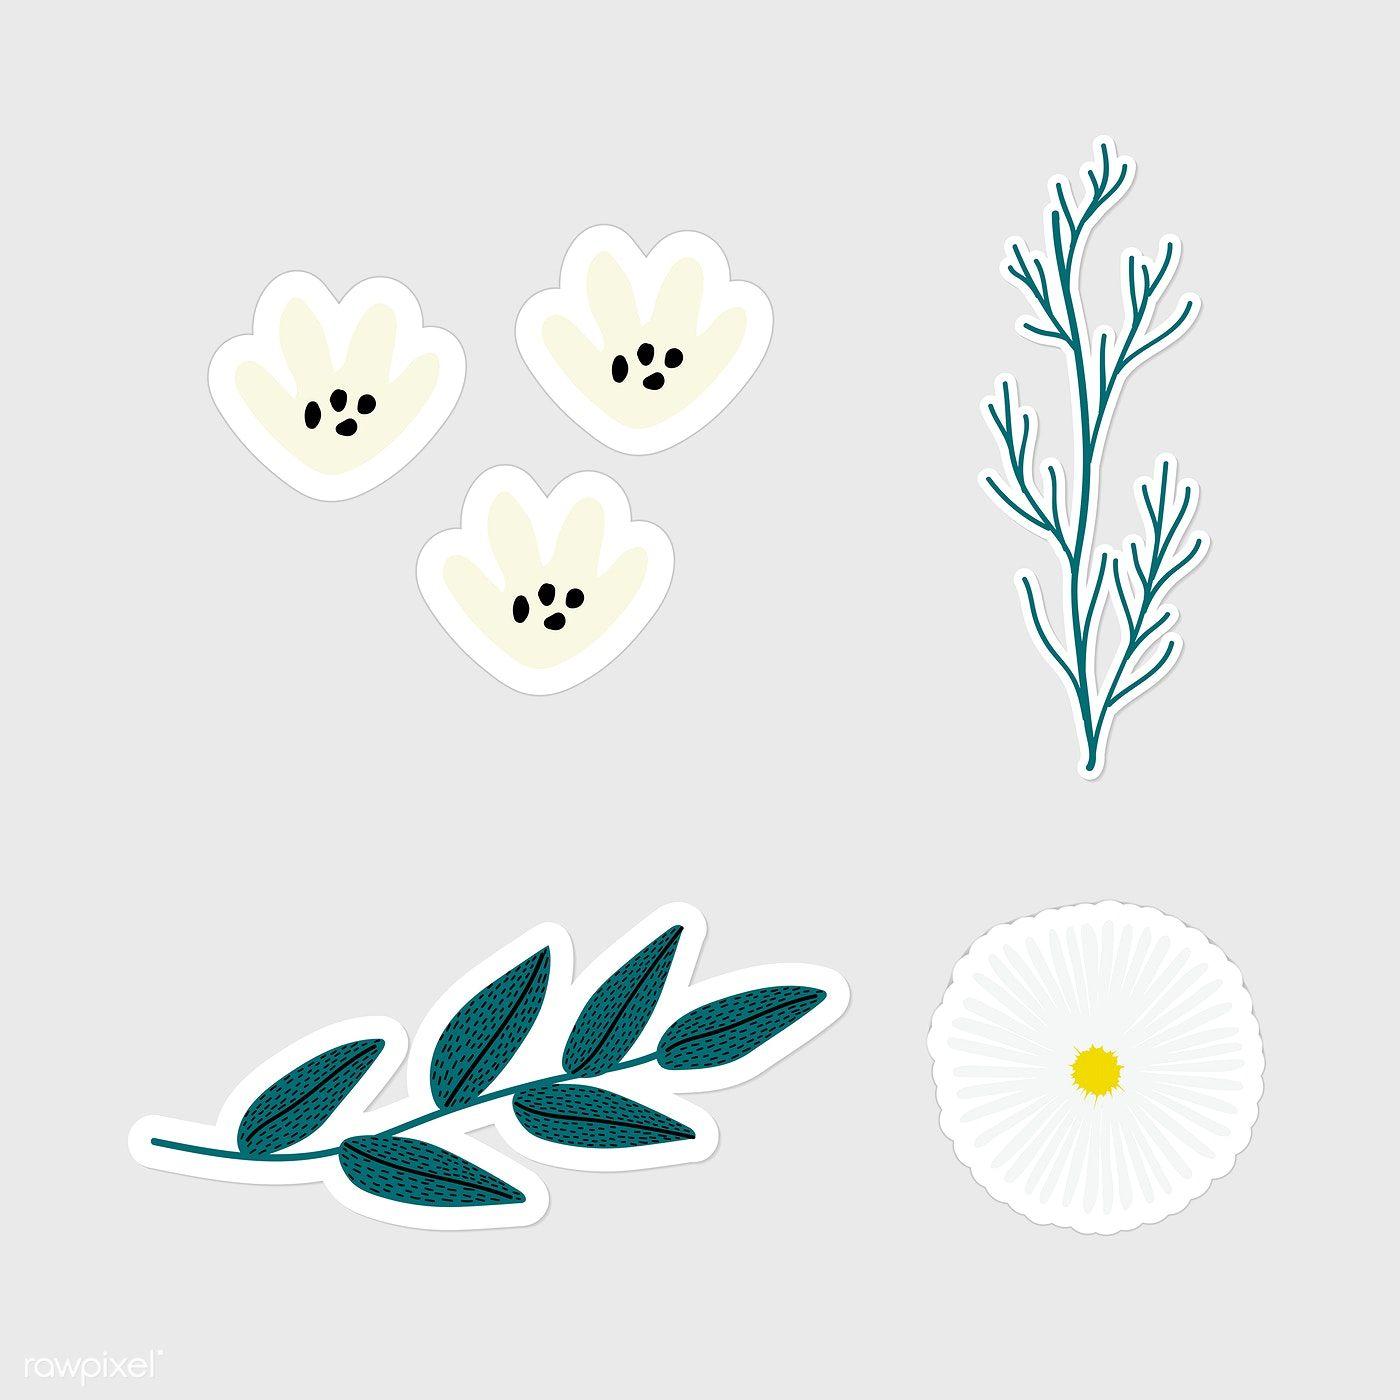 Download Premium Illustration Of Set Of Flowers And Leaves Sticker Doodle Flower Illustration Flower Doodles Floral Stickers [ 1400 x 1400 Pixel ]